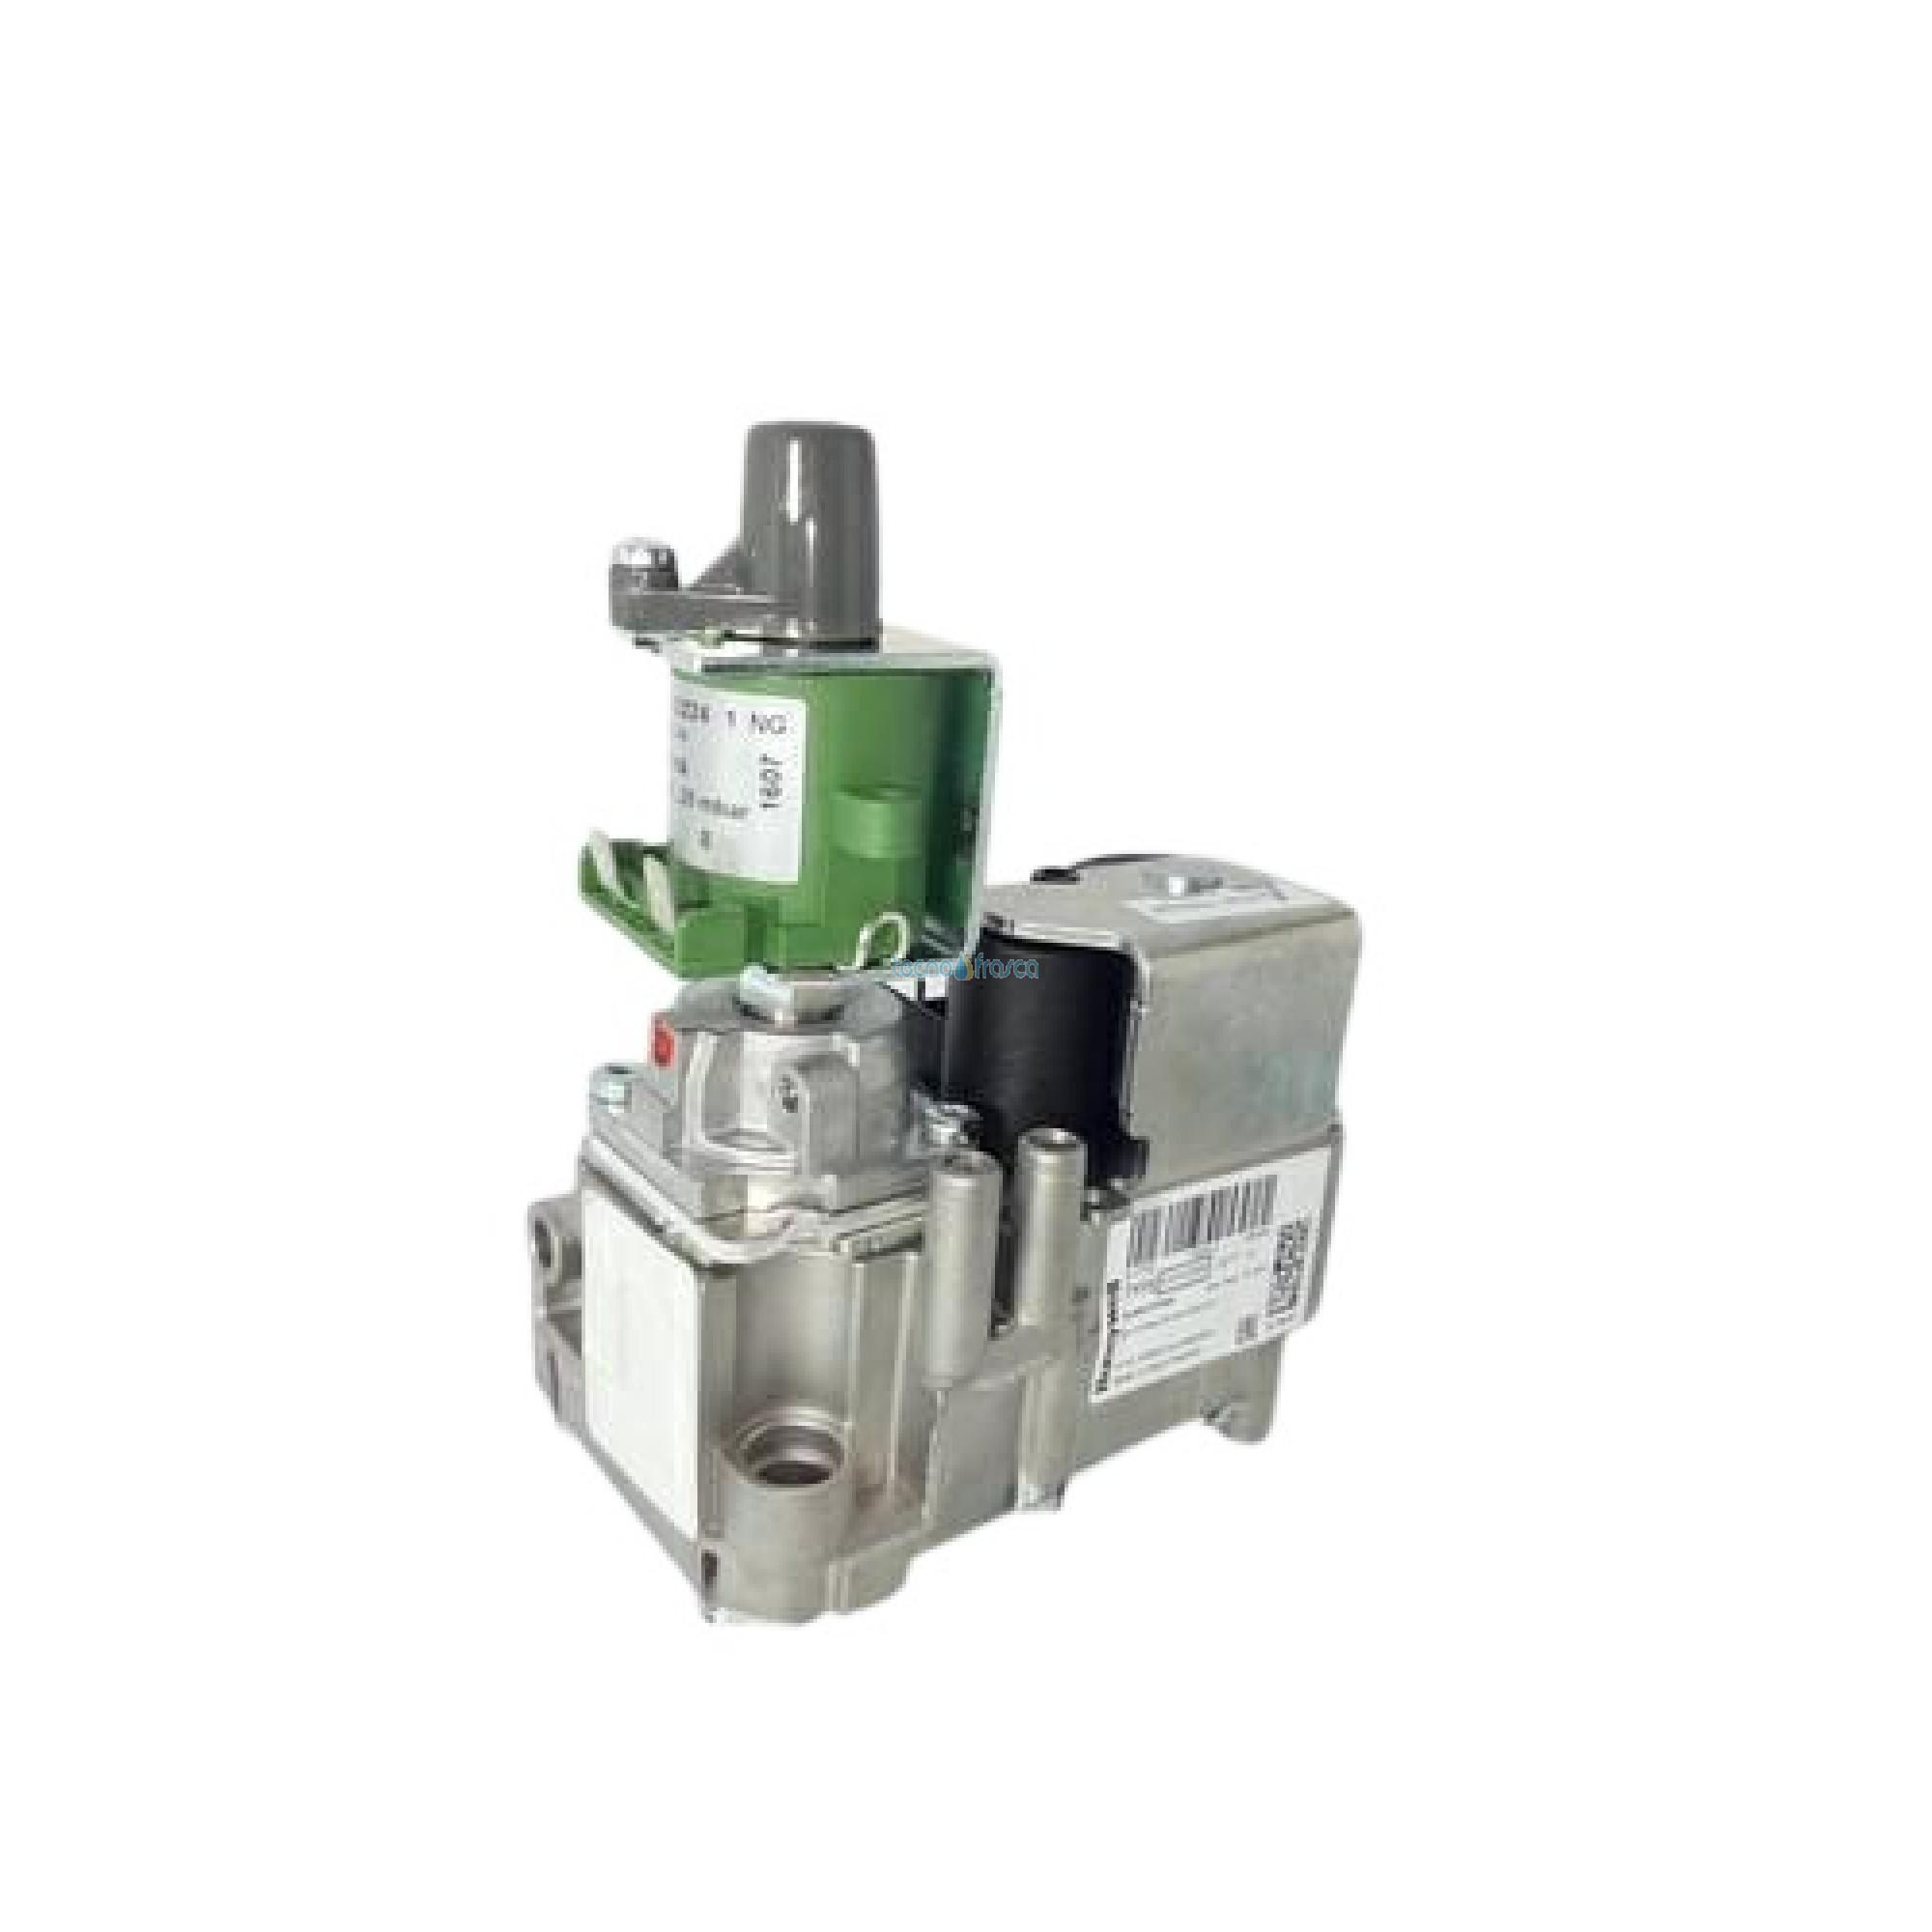 Saunier duval valvola gas vk4105m2089 05720000